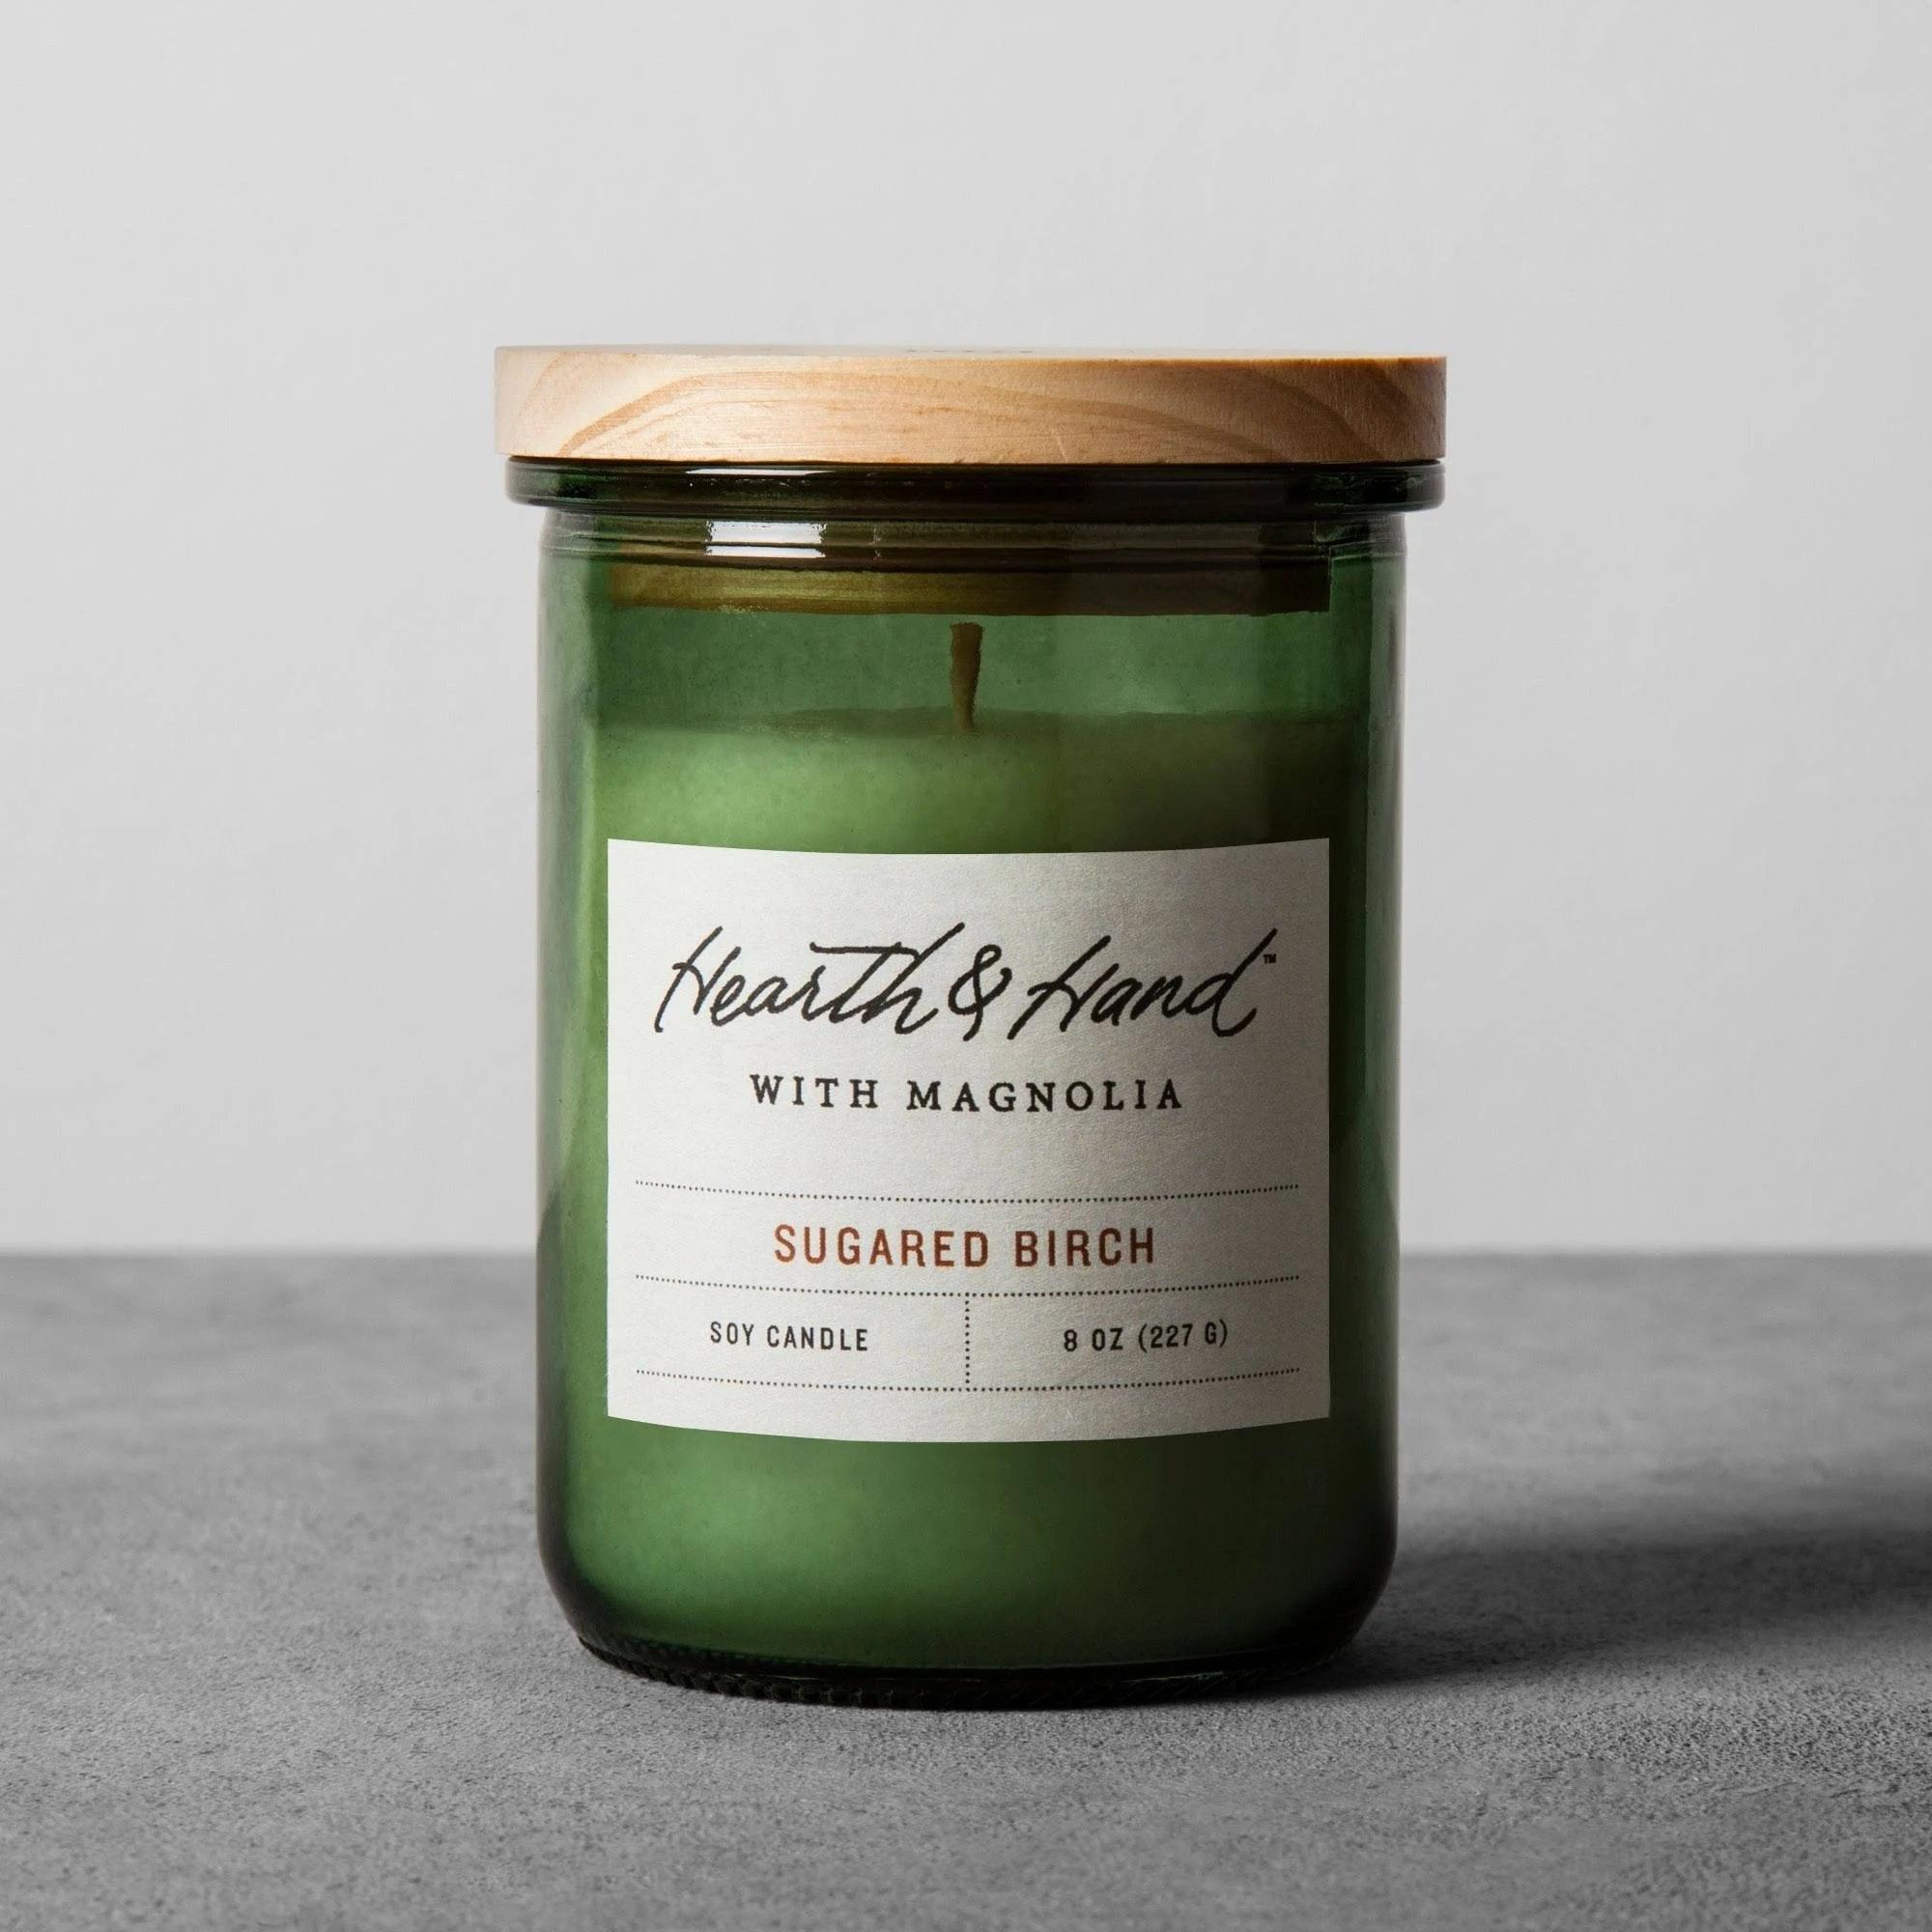 Hearth and Hand Sugared Birch Candle